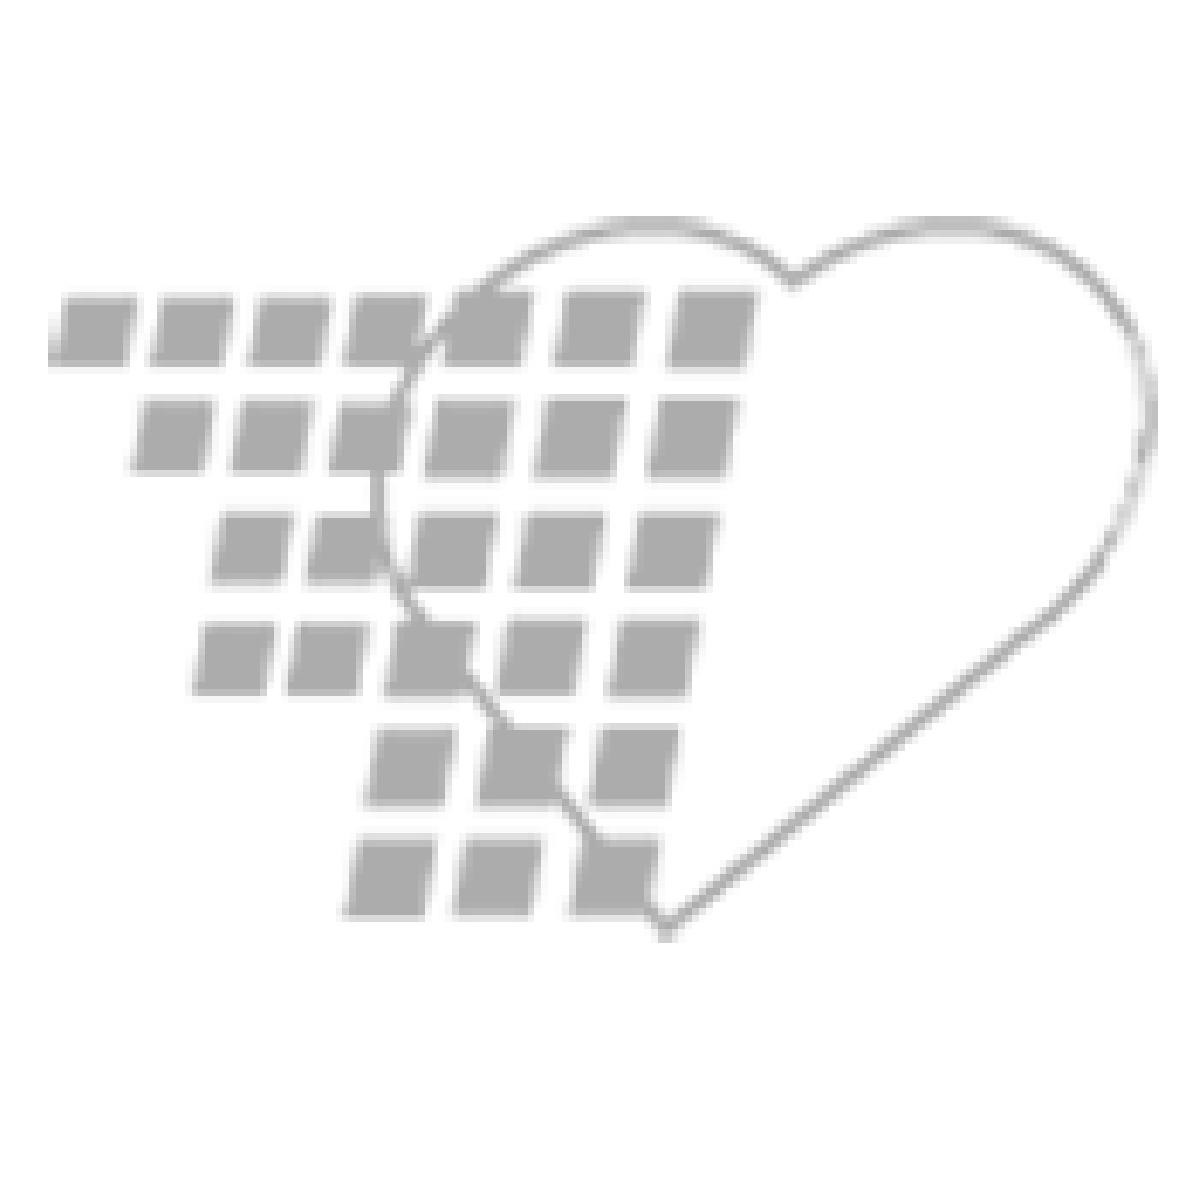 06-93-1705 Demo Dose® Capsule Gel Red/White Med Oval - 1000 Pills/Jar